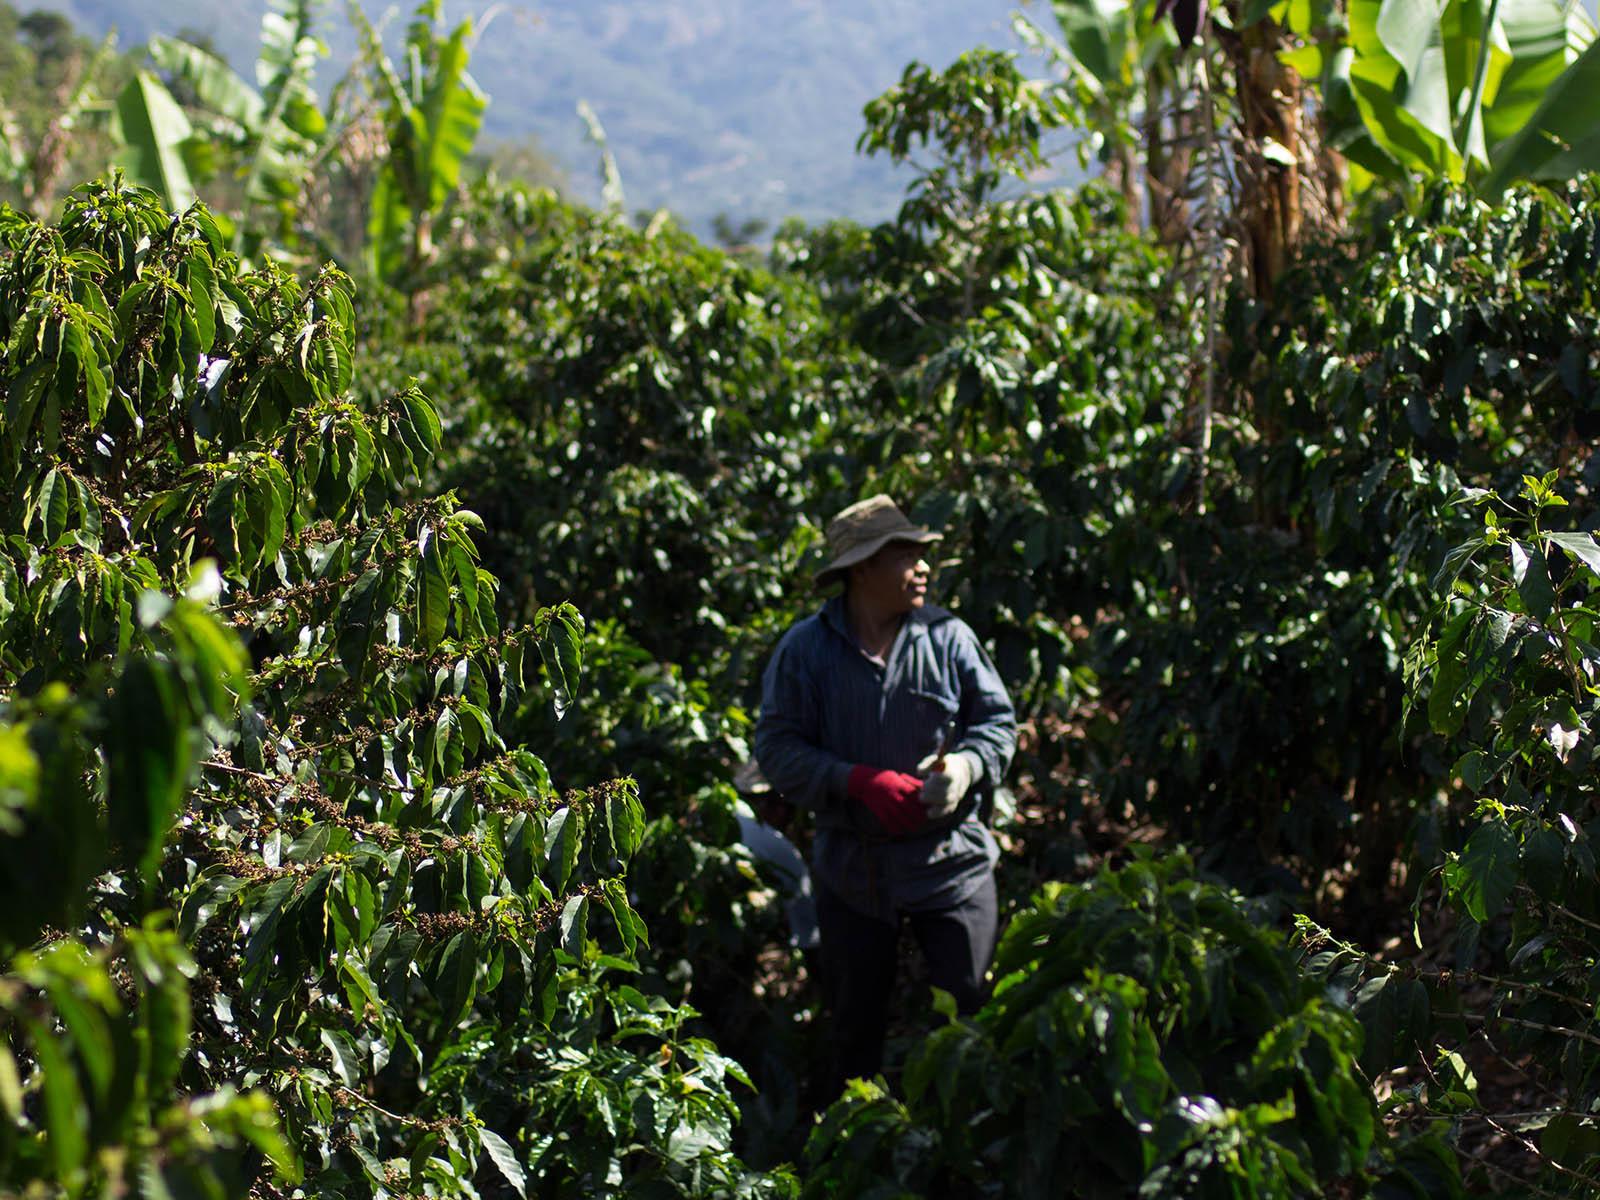 Erster klimaneutraler Kaffee weltweit